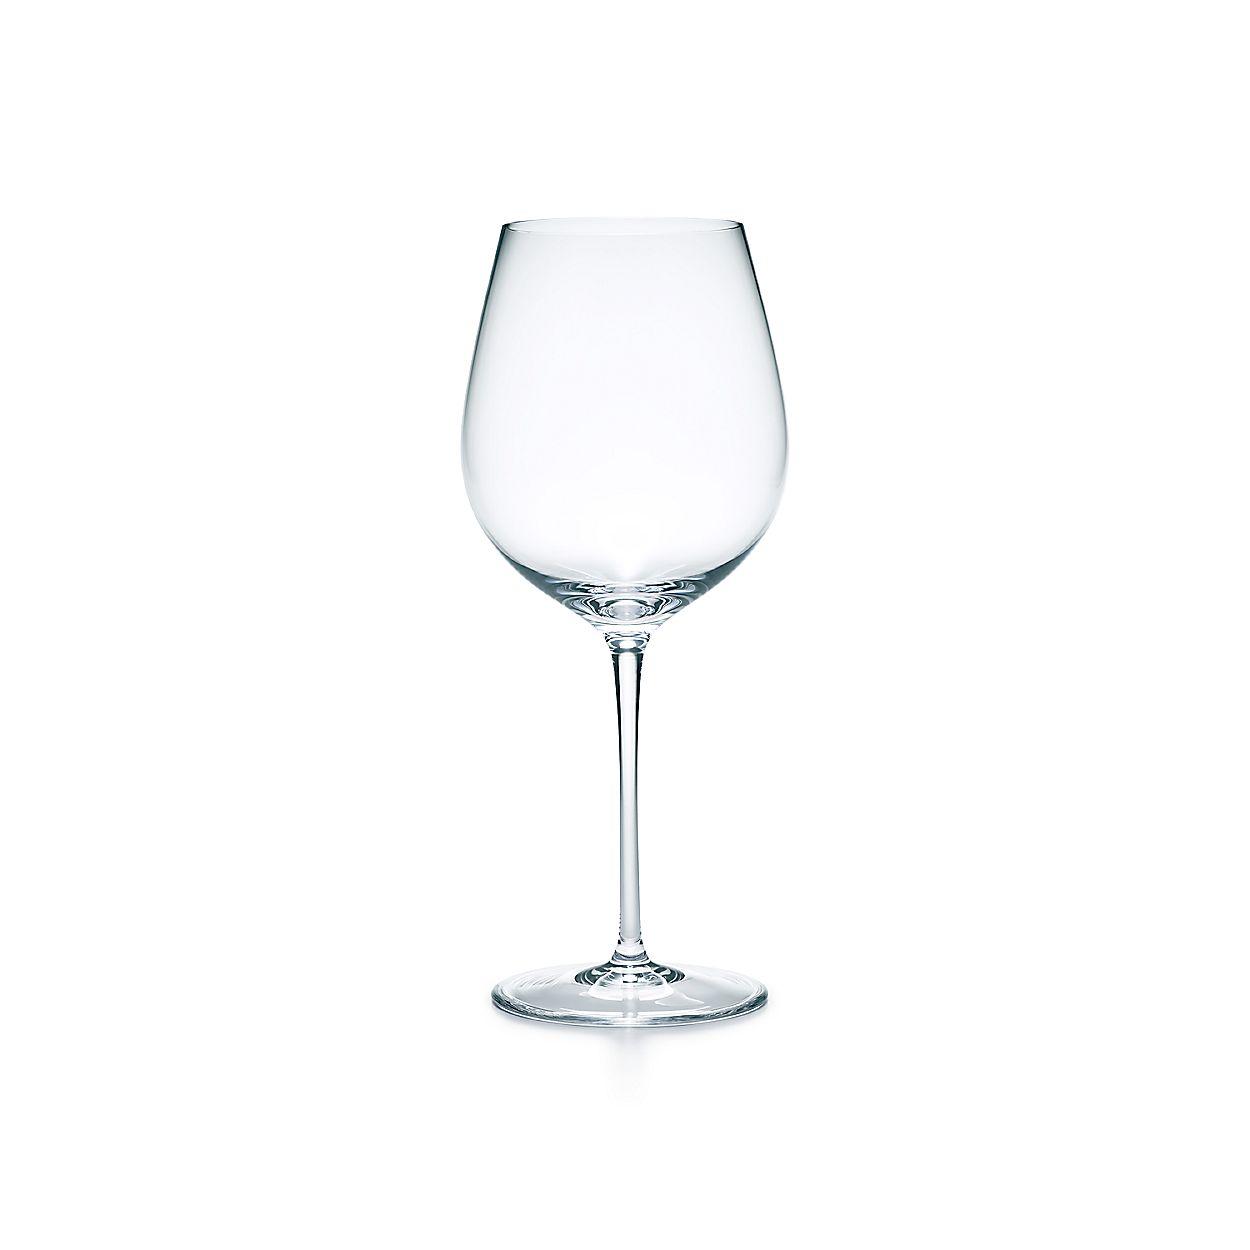 b3fcd8512239 All-purpose red wine glass in handmade